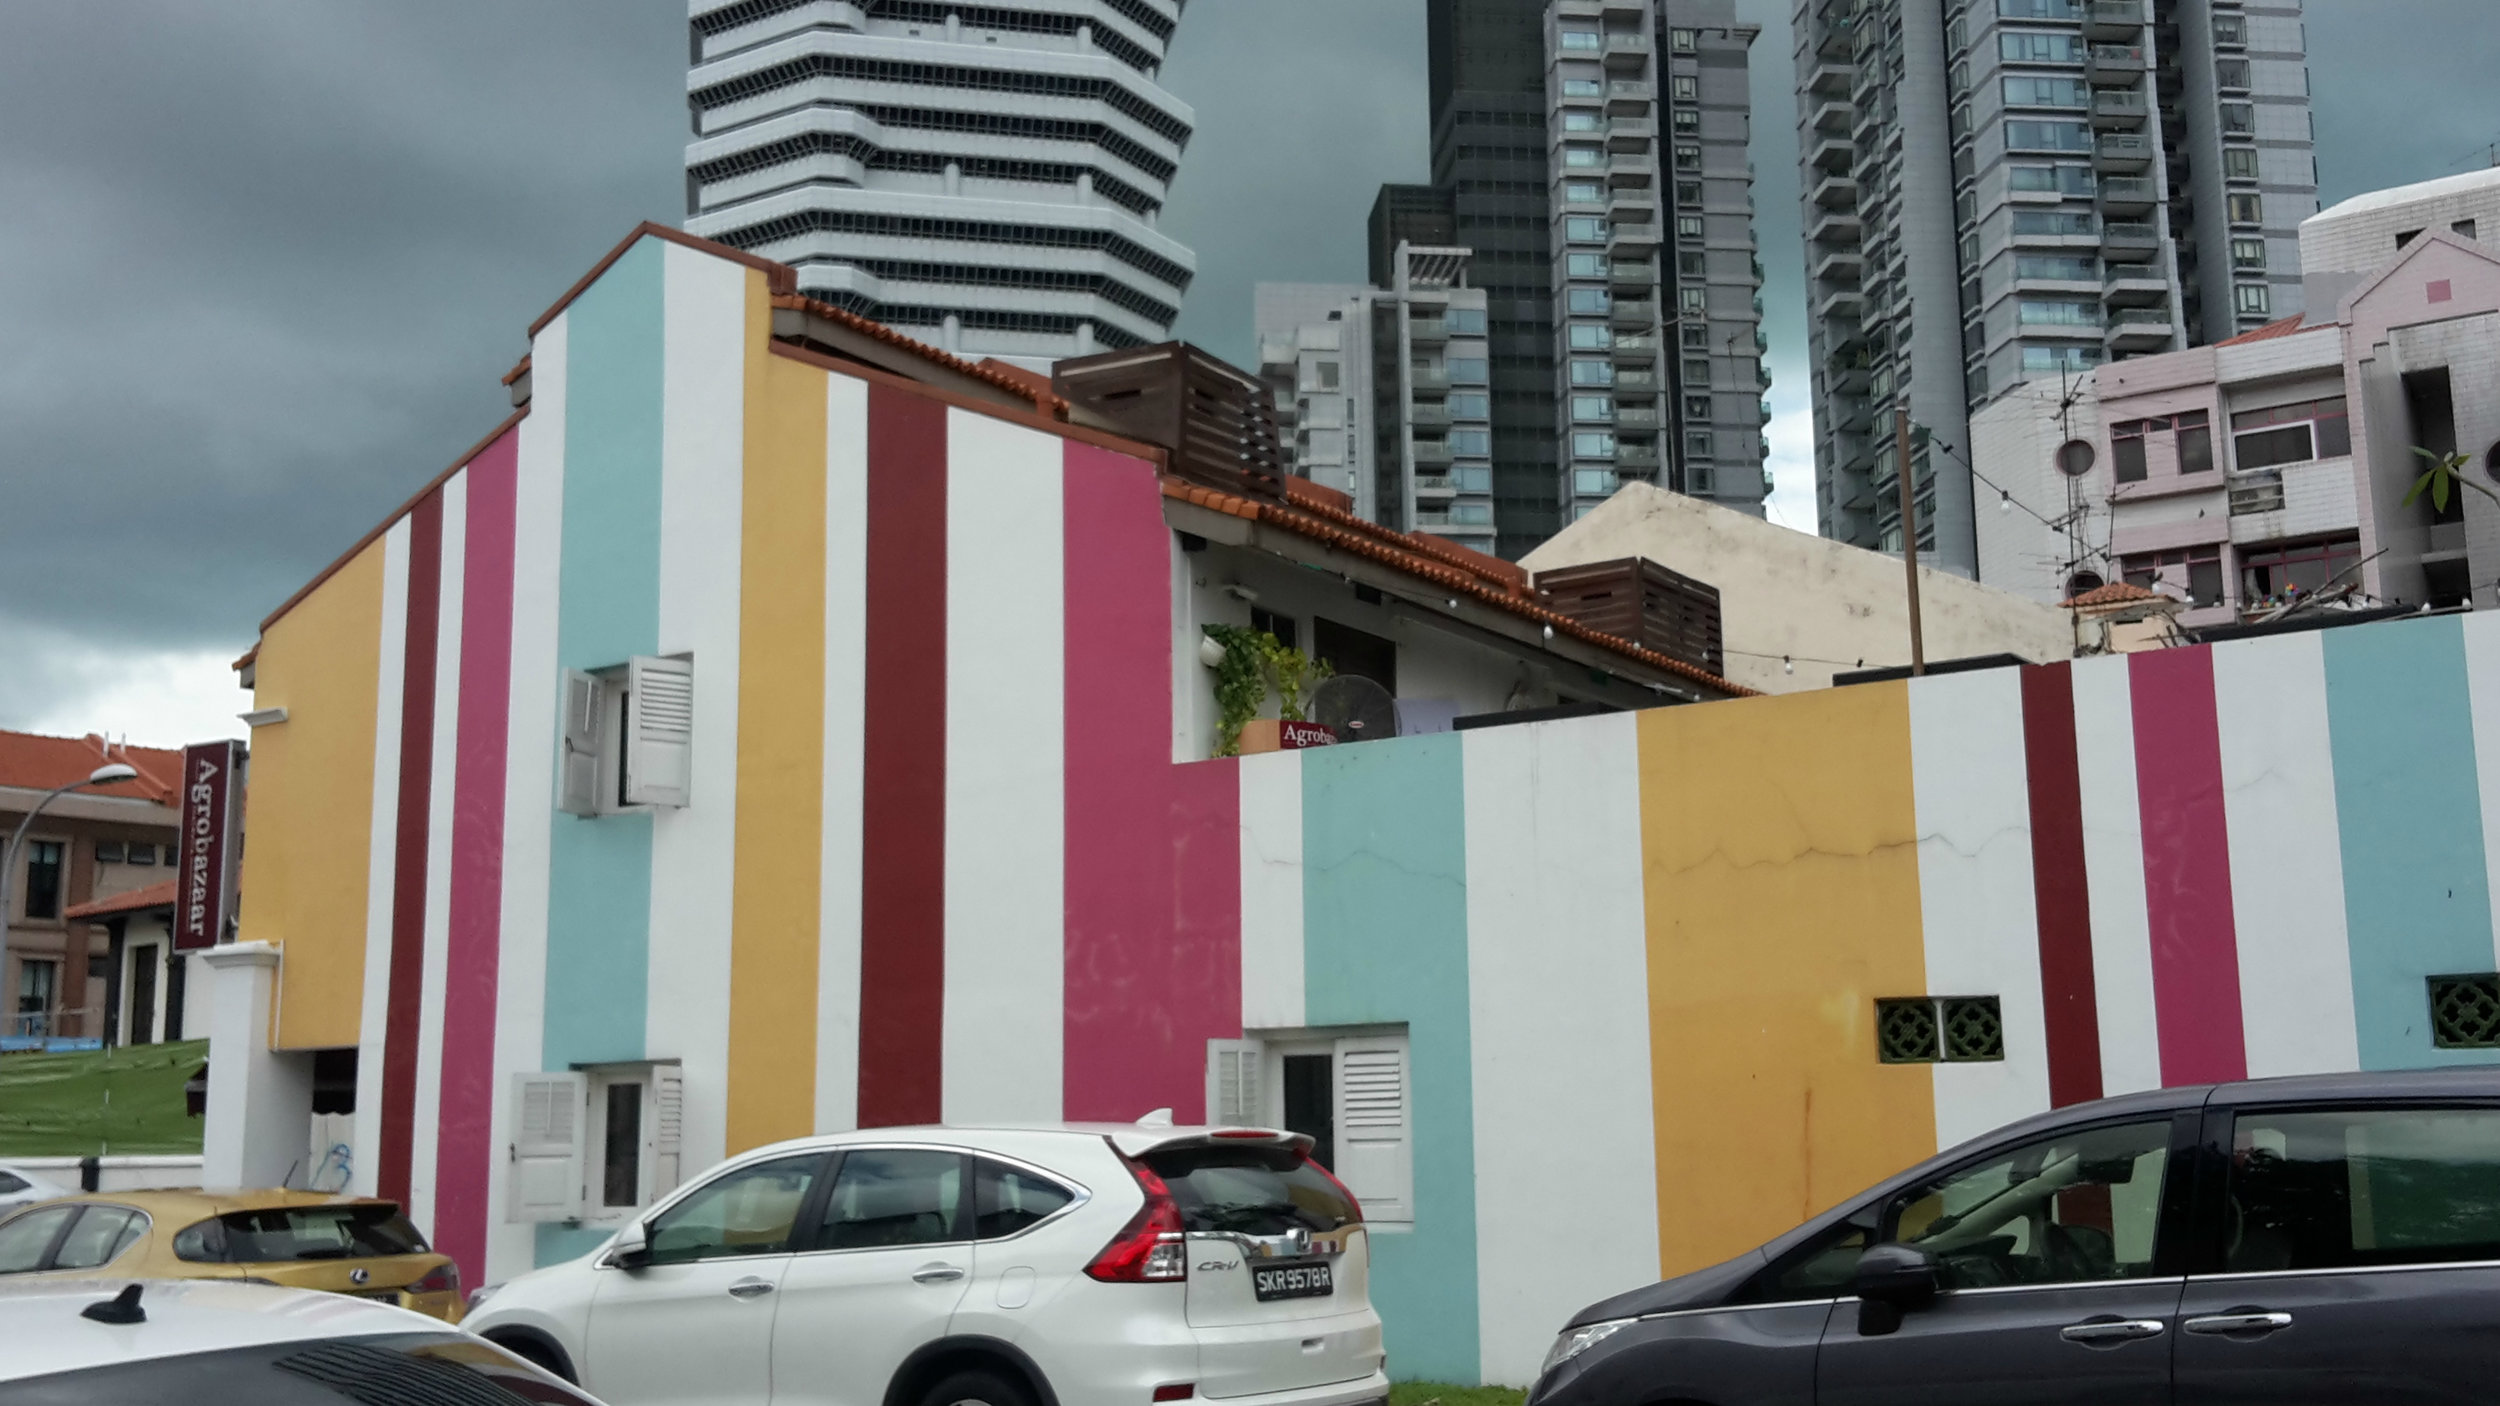 Striped buildings, Singapore